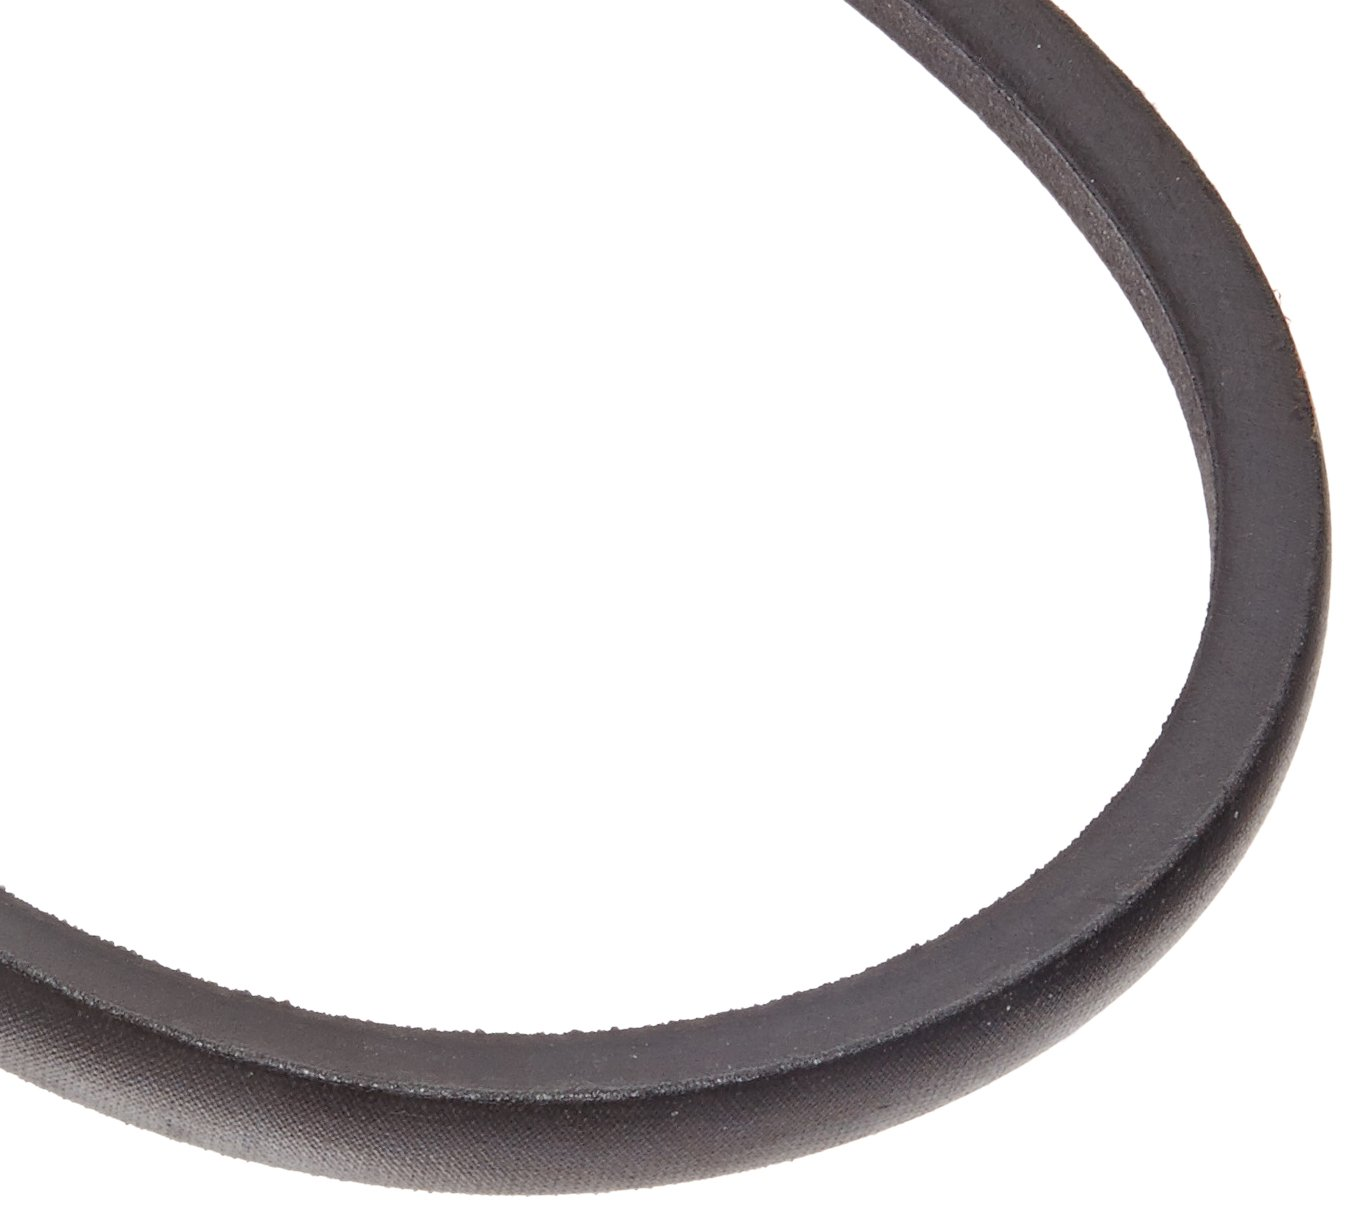 MITSUBISHI MOTORS REMF6440 Replacement Belt